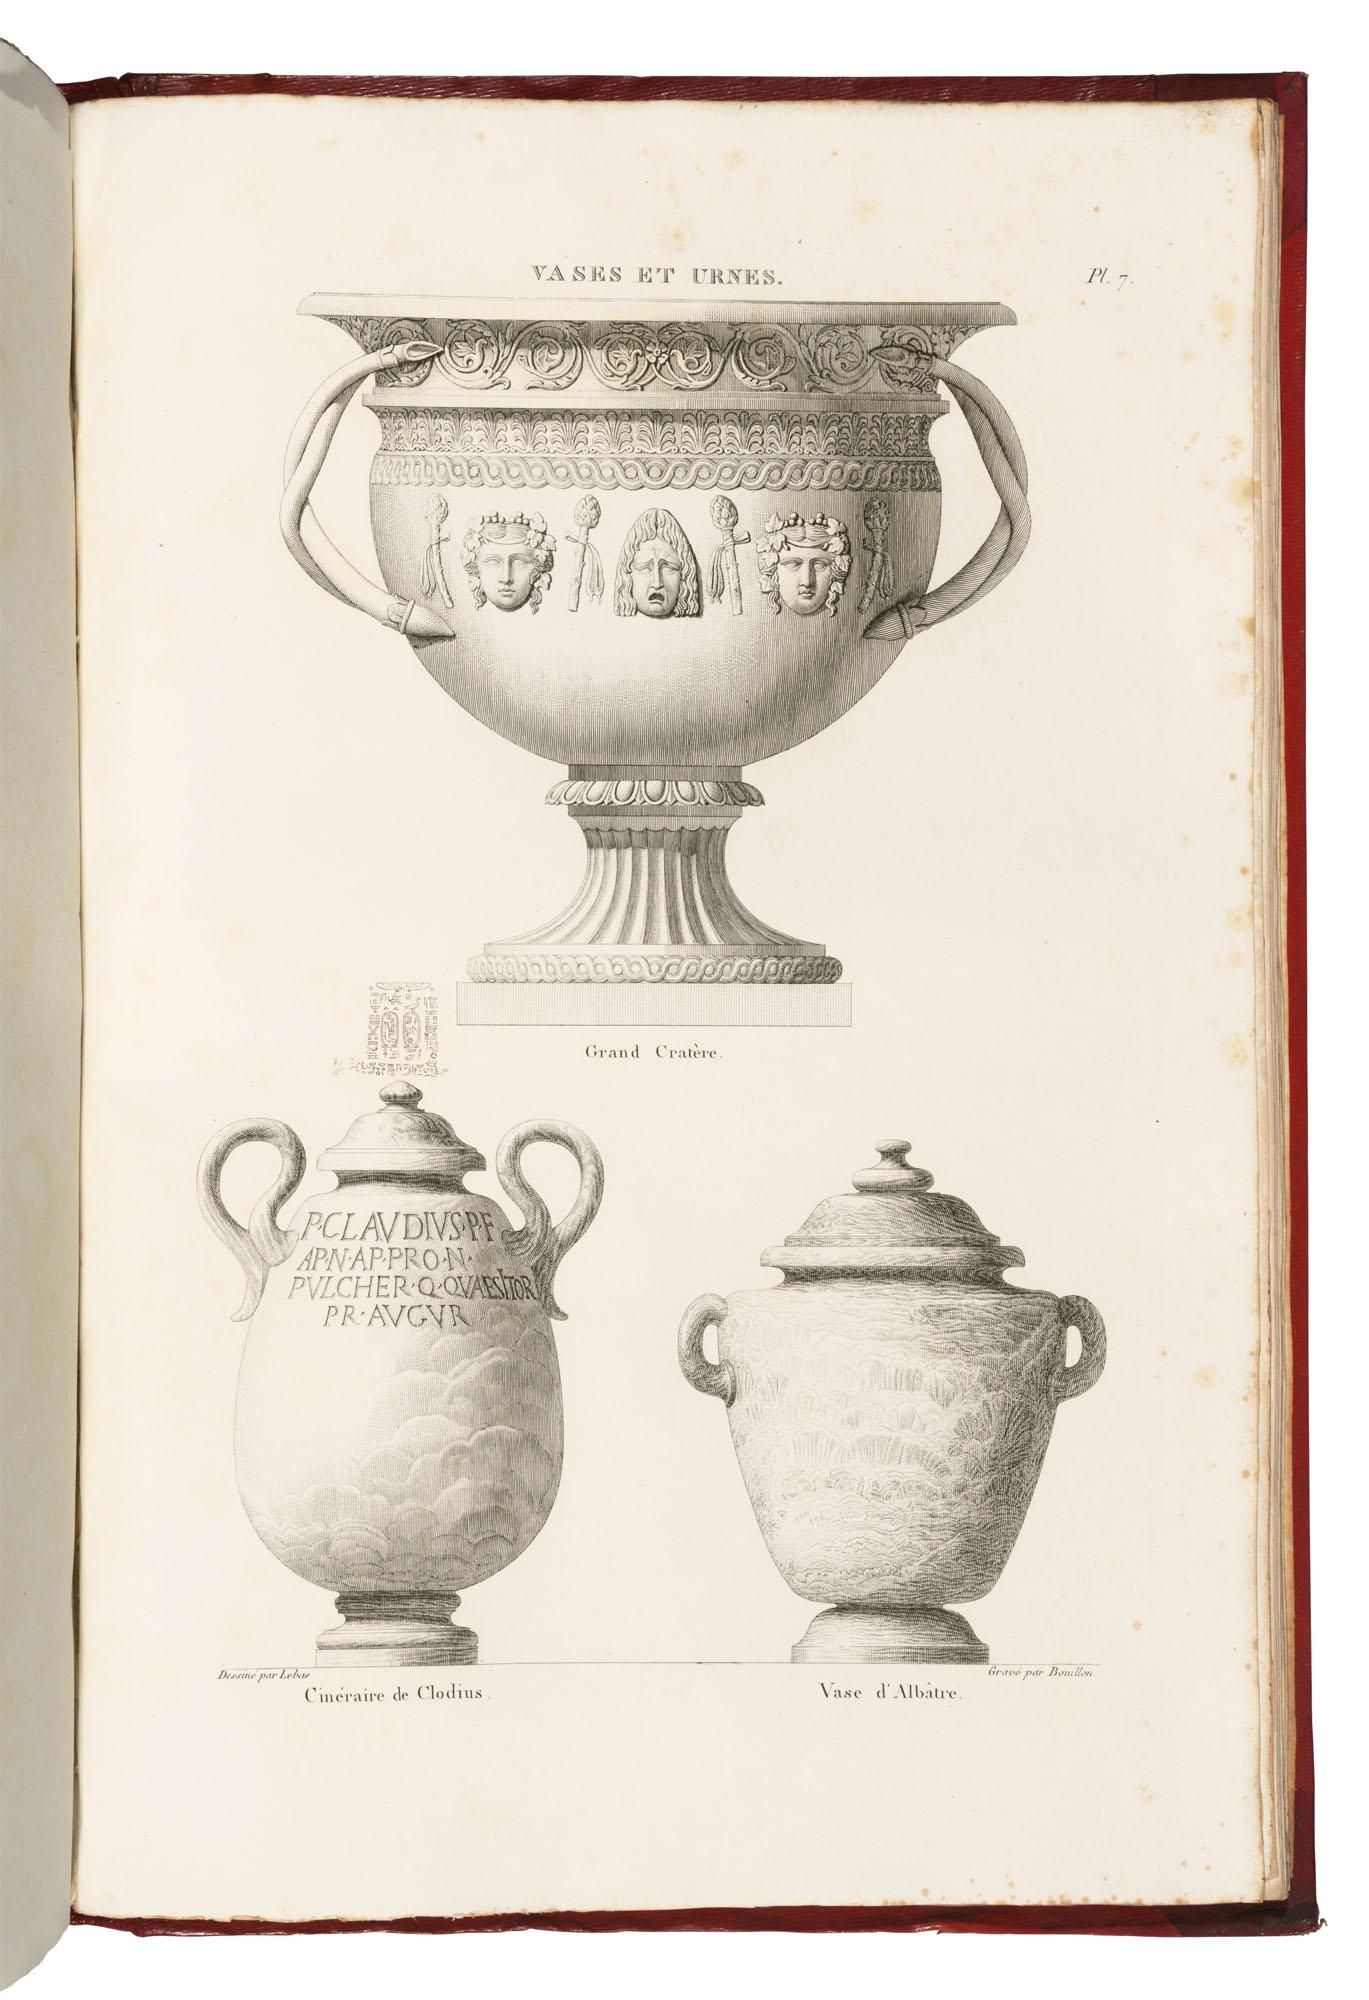 Pierre Bouillon (1776-1831)